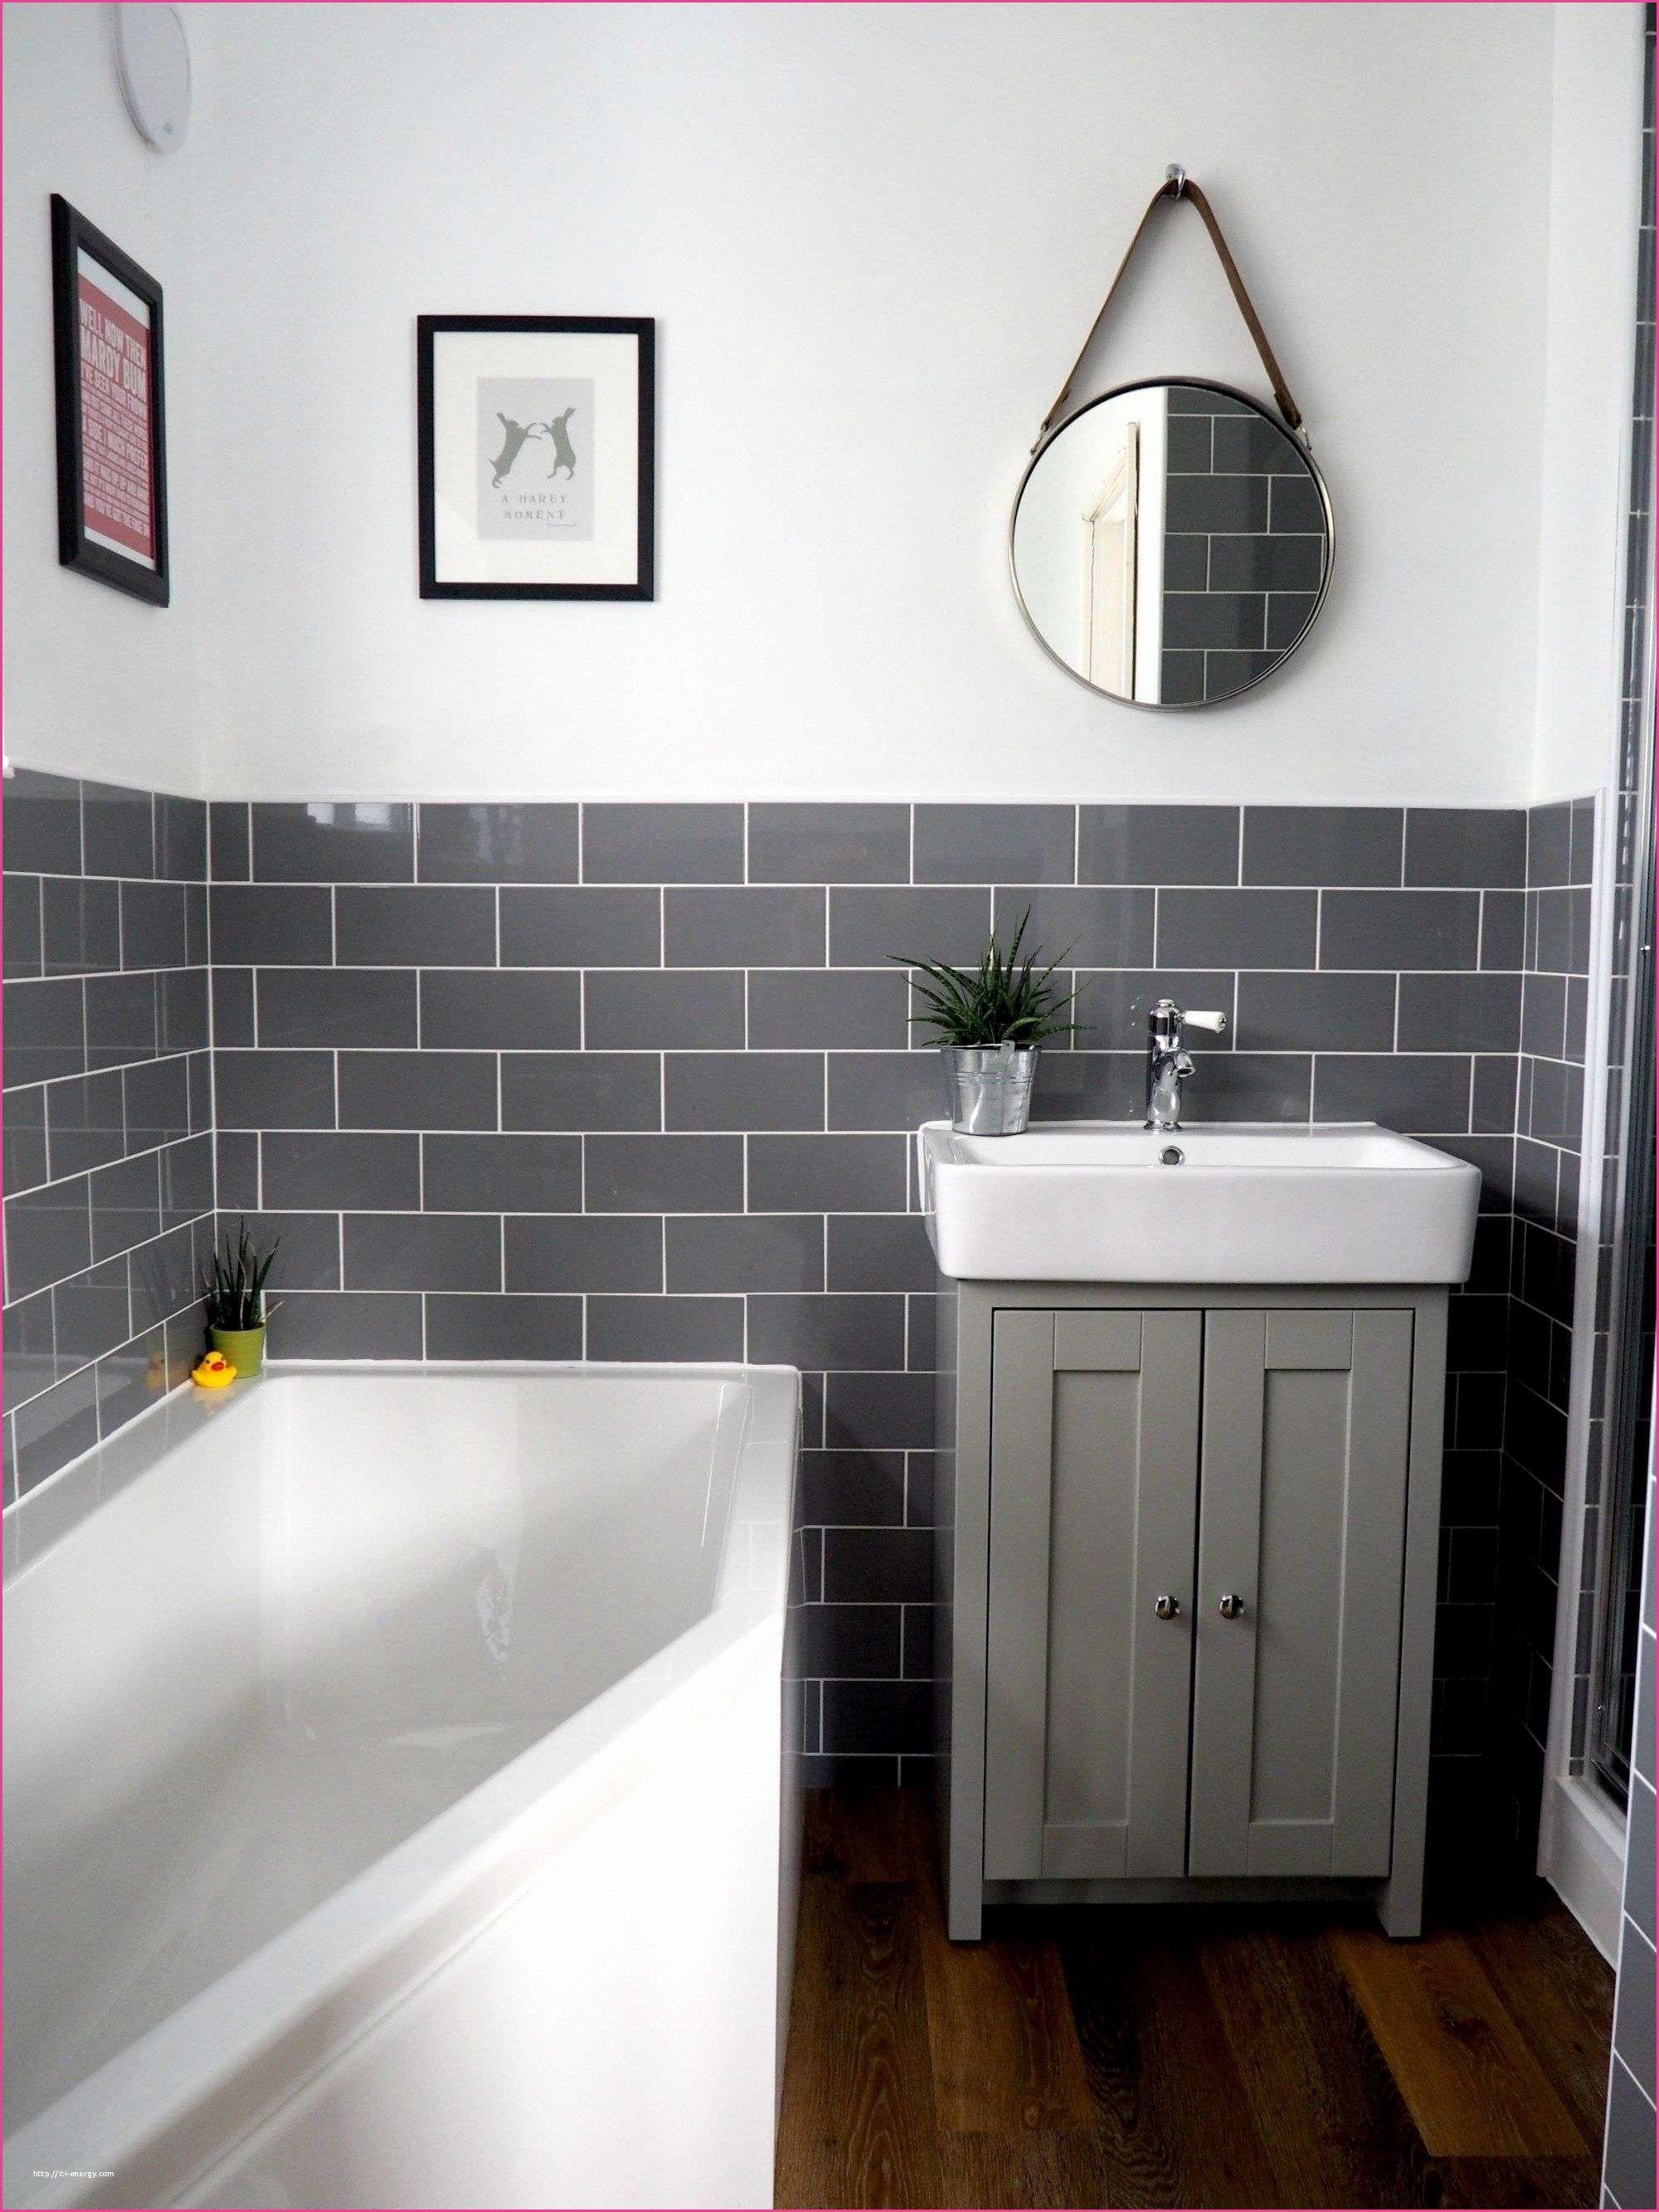 35 Challenging Green Glass Tile Kamar Mandi Kecil Interior Kamar Mandi Desain Kamar Mandi Modern